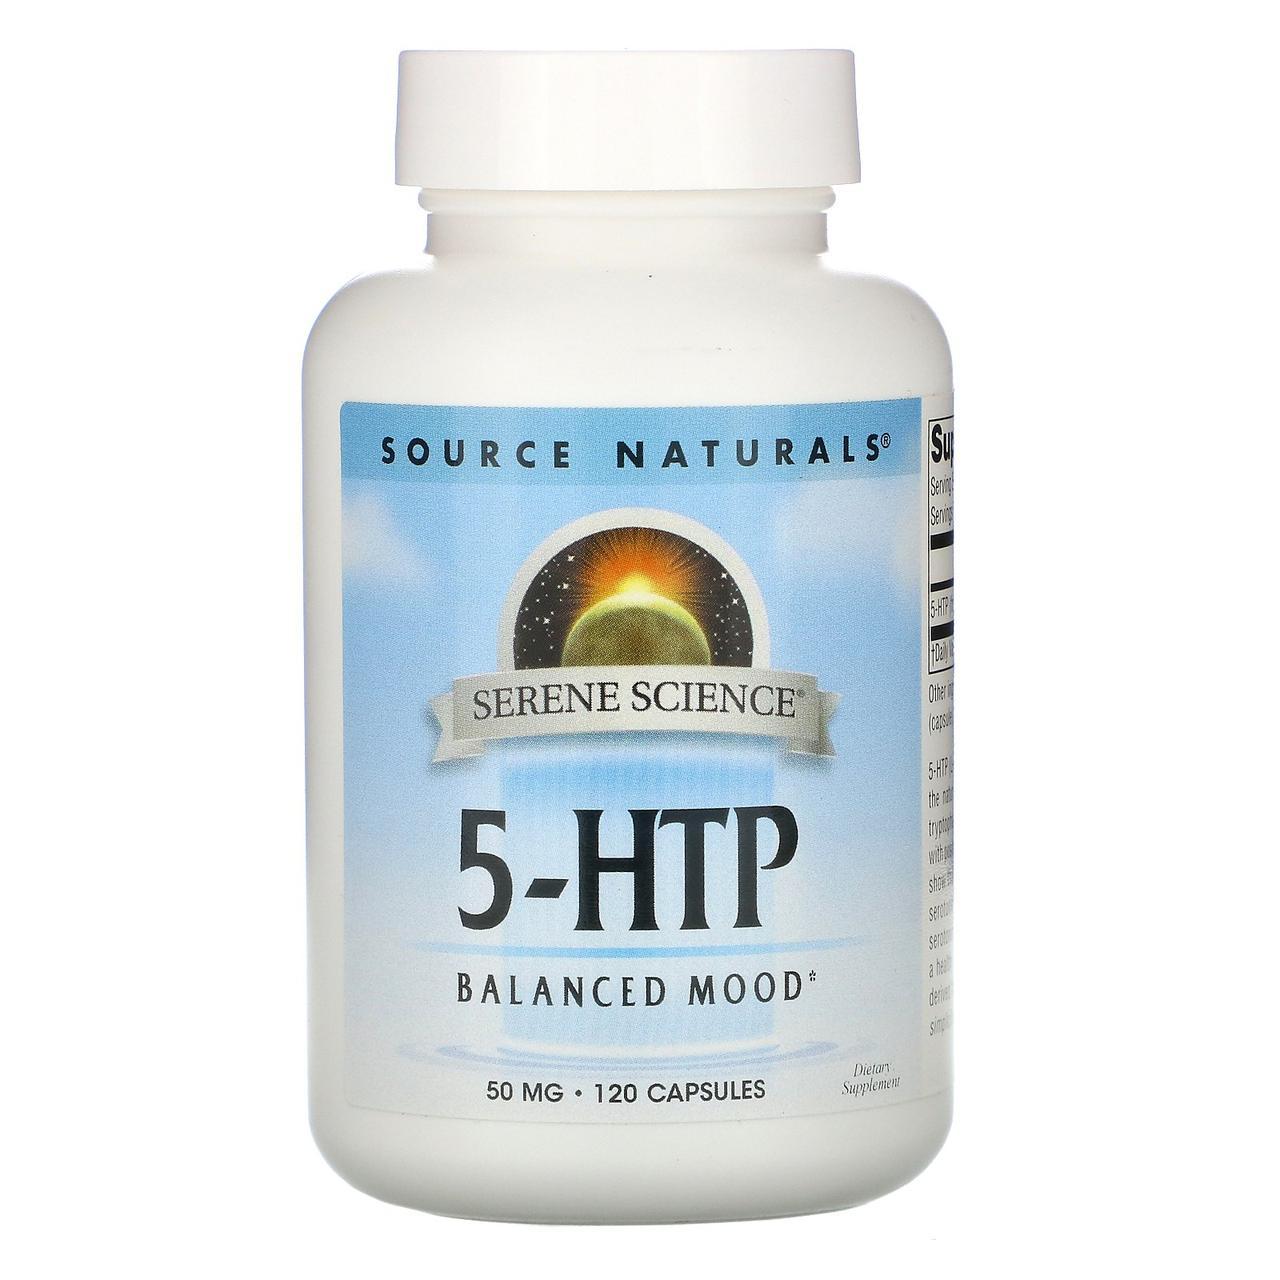 5-гідрокси L-триптофан (5-НТР), Source Naturals, 50 мг, 120 капсул